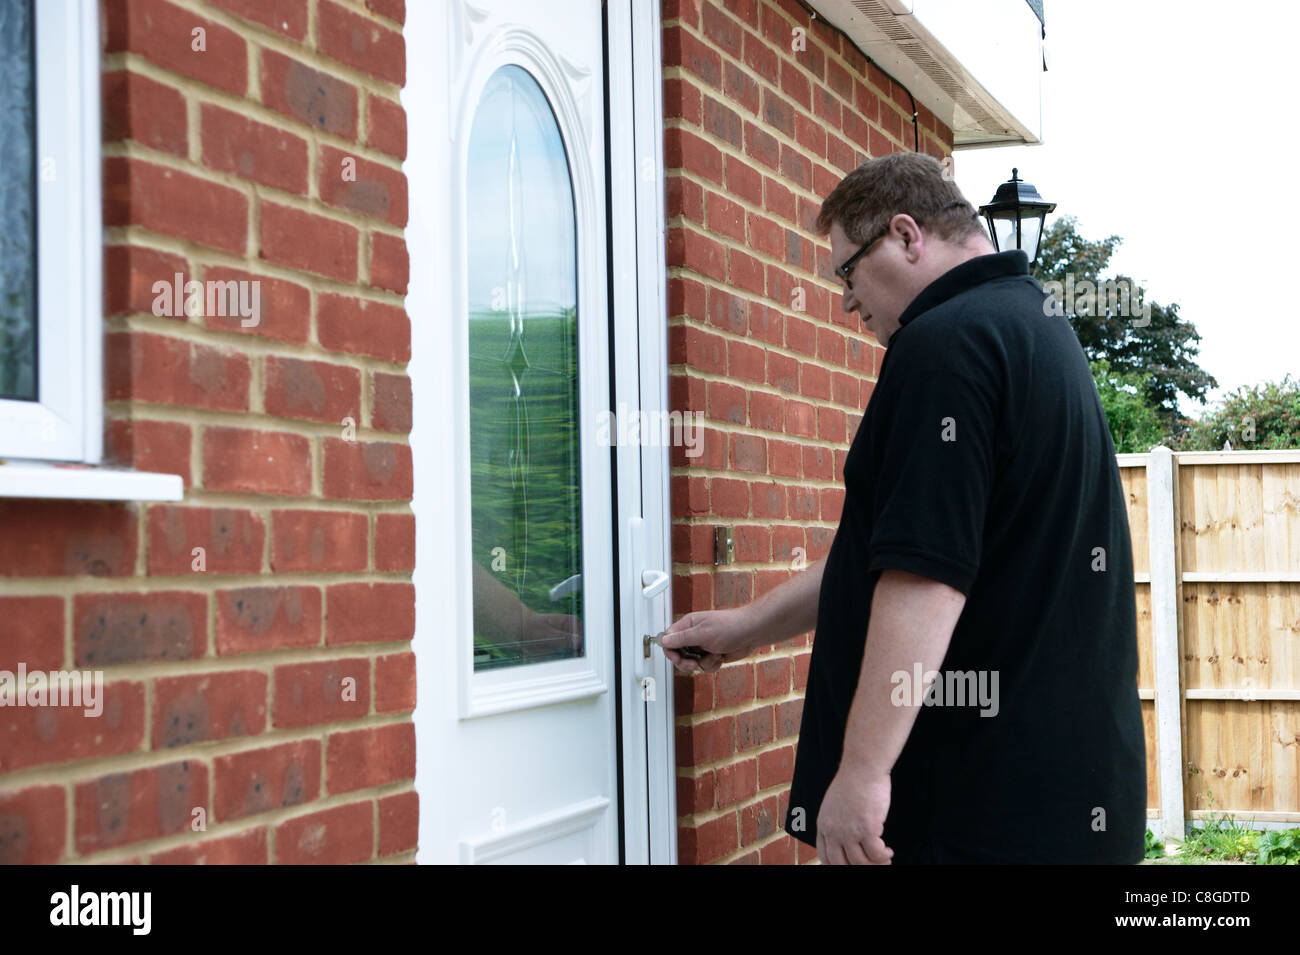 person locking door. Man Locking / Unlocking Front Door Of Property Person